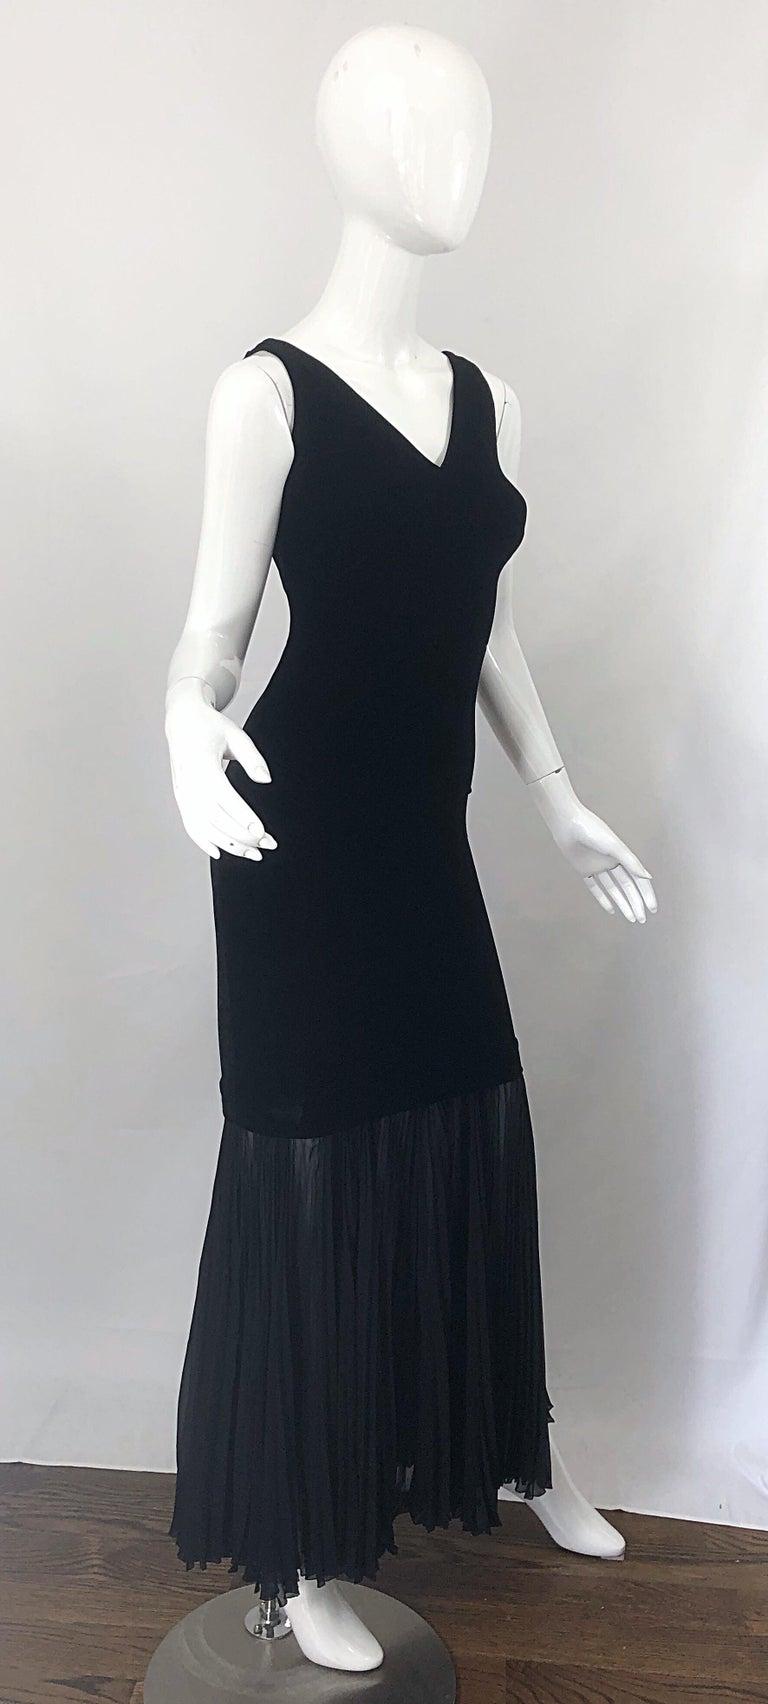 1990s Jean Paul Gaultier Avant Garde Black Velvet Vintage 90s Mermaid Gown Dress For Sale 1